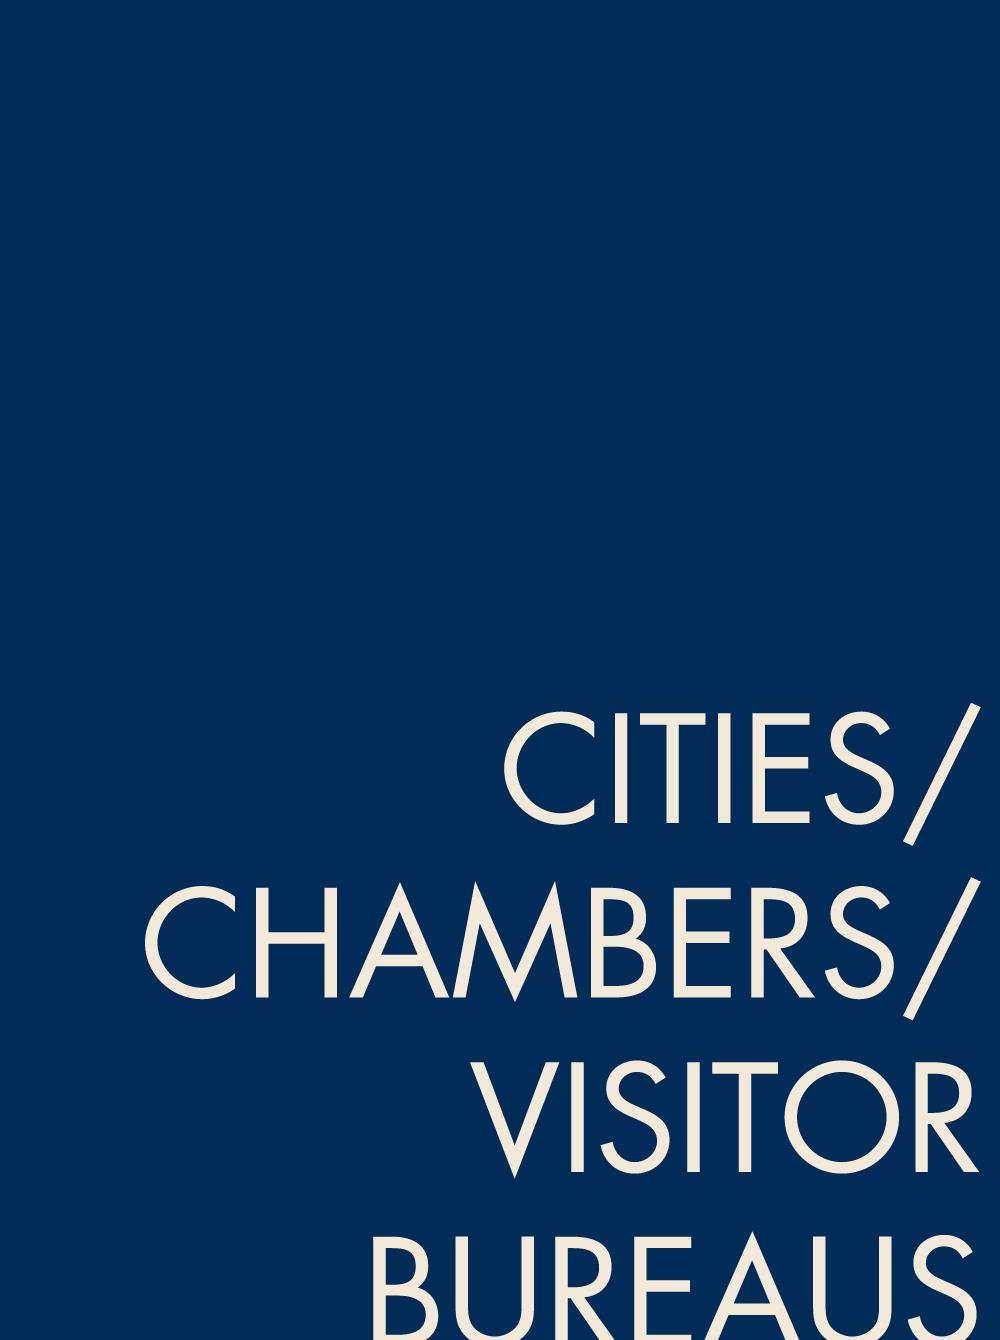 CITIES / CHAMBERS / VISITOR BUREAUS   HUNTSVILLE CHAMBER OF COMMERCE  BRYAN/COLLEGE STATION CVB  BRAZOS VALLEY CHAMBER OF COMMERCE  BRAZOS COUNTY EXPO CENTER